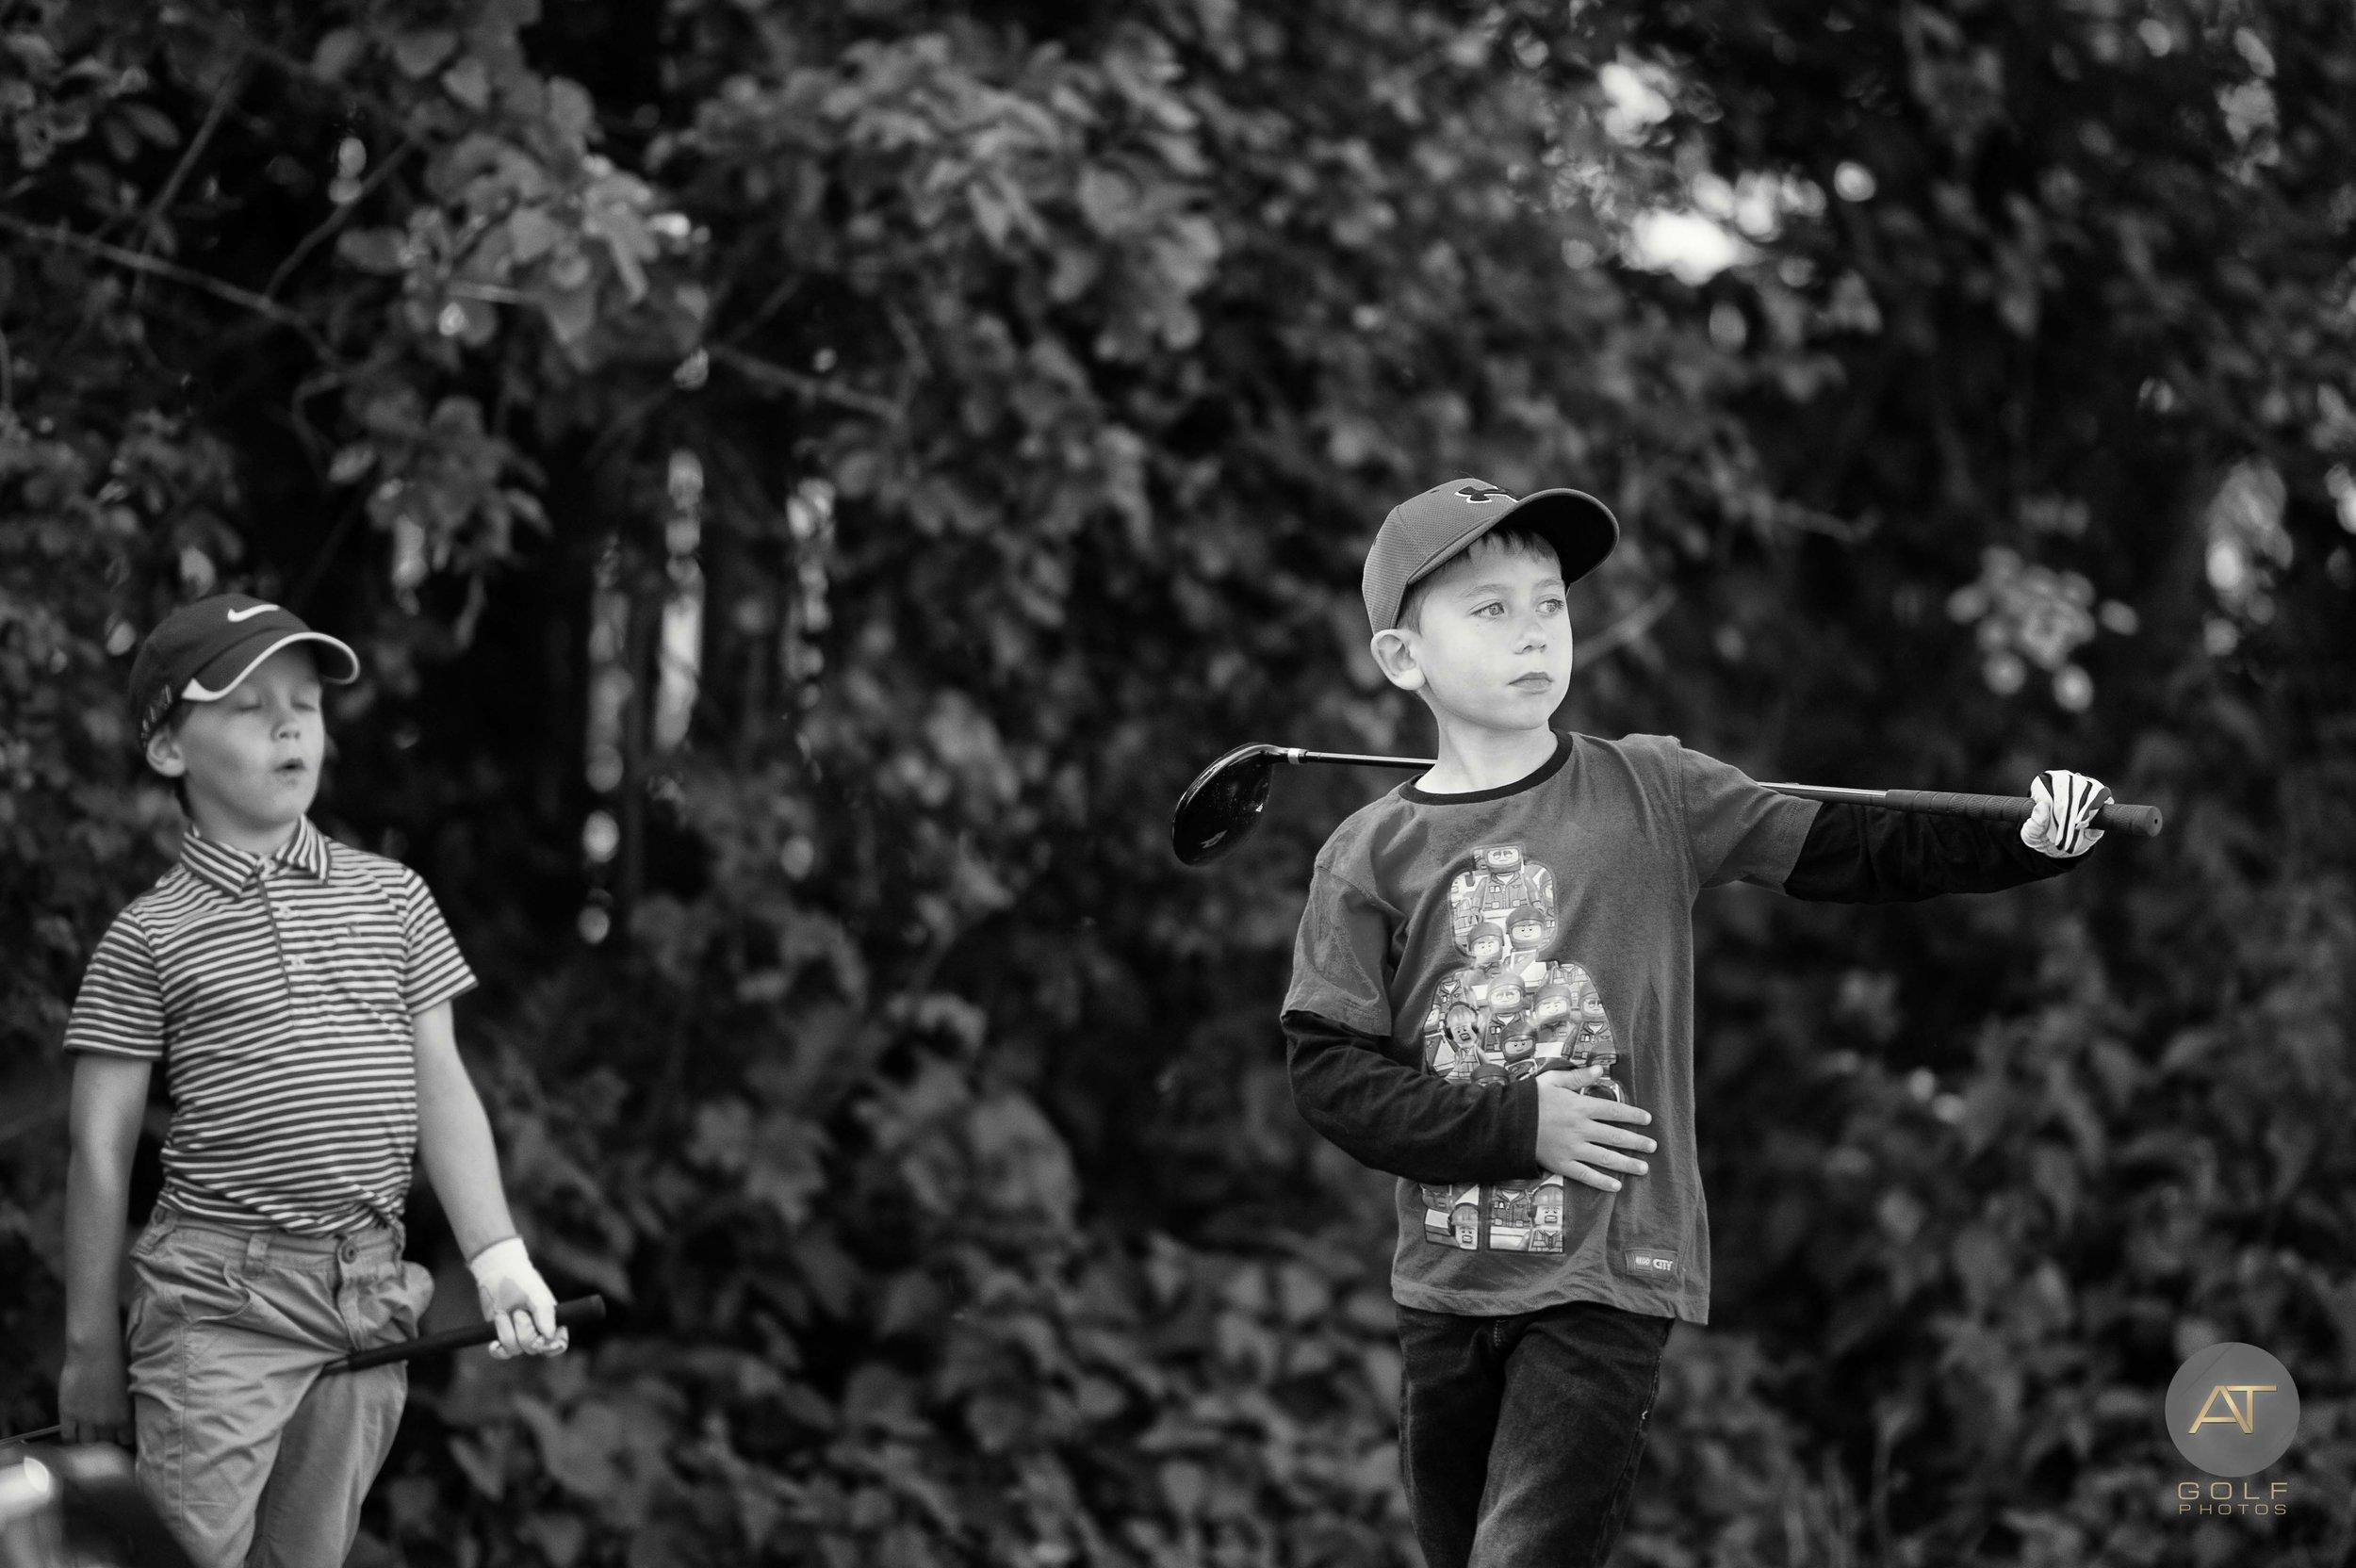 Russell Adams Junior Golf Academy Hadzor Aniko Towers Golf photos-27.jpg